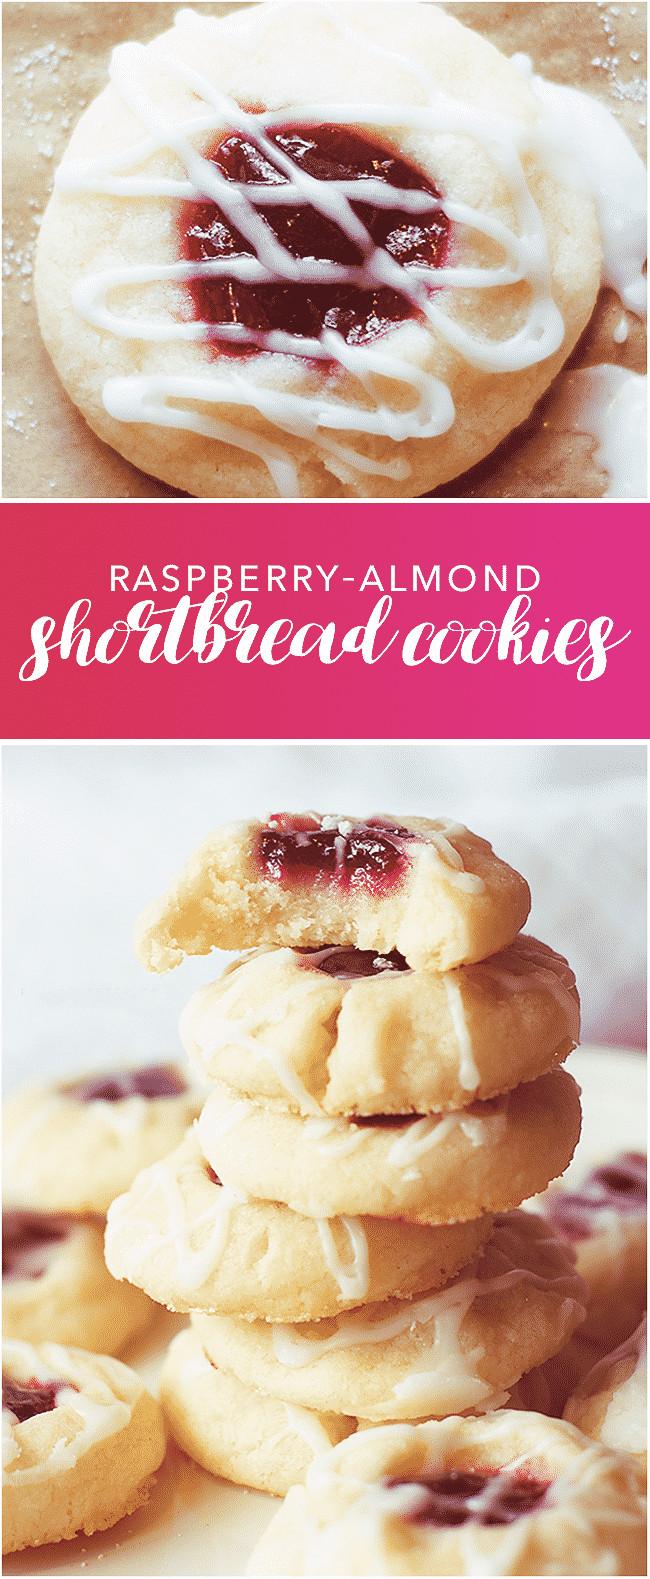 Raspberry Shortbread Cookies  Raspberry Almond Shortbread Cookies